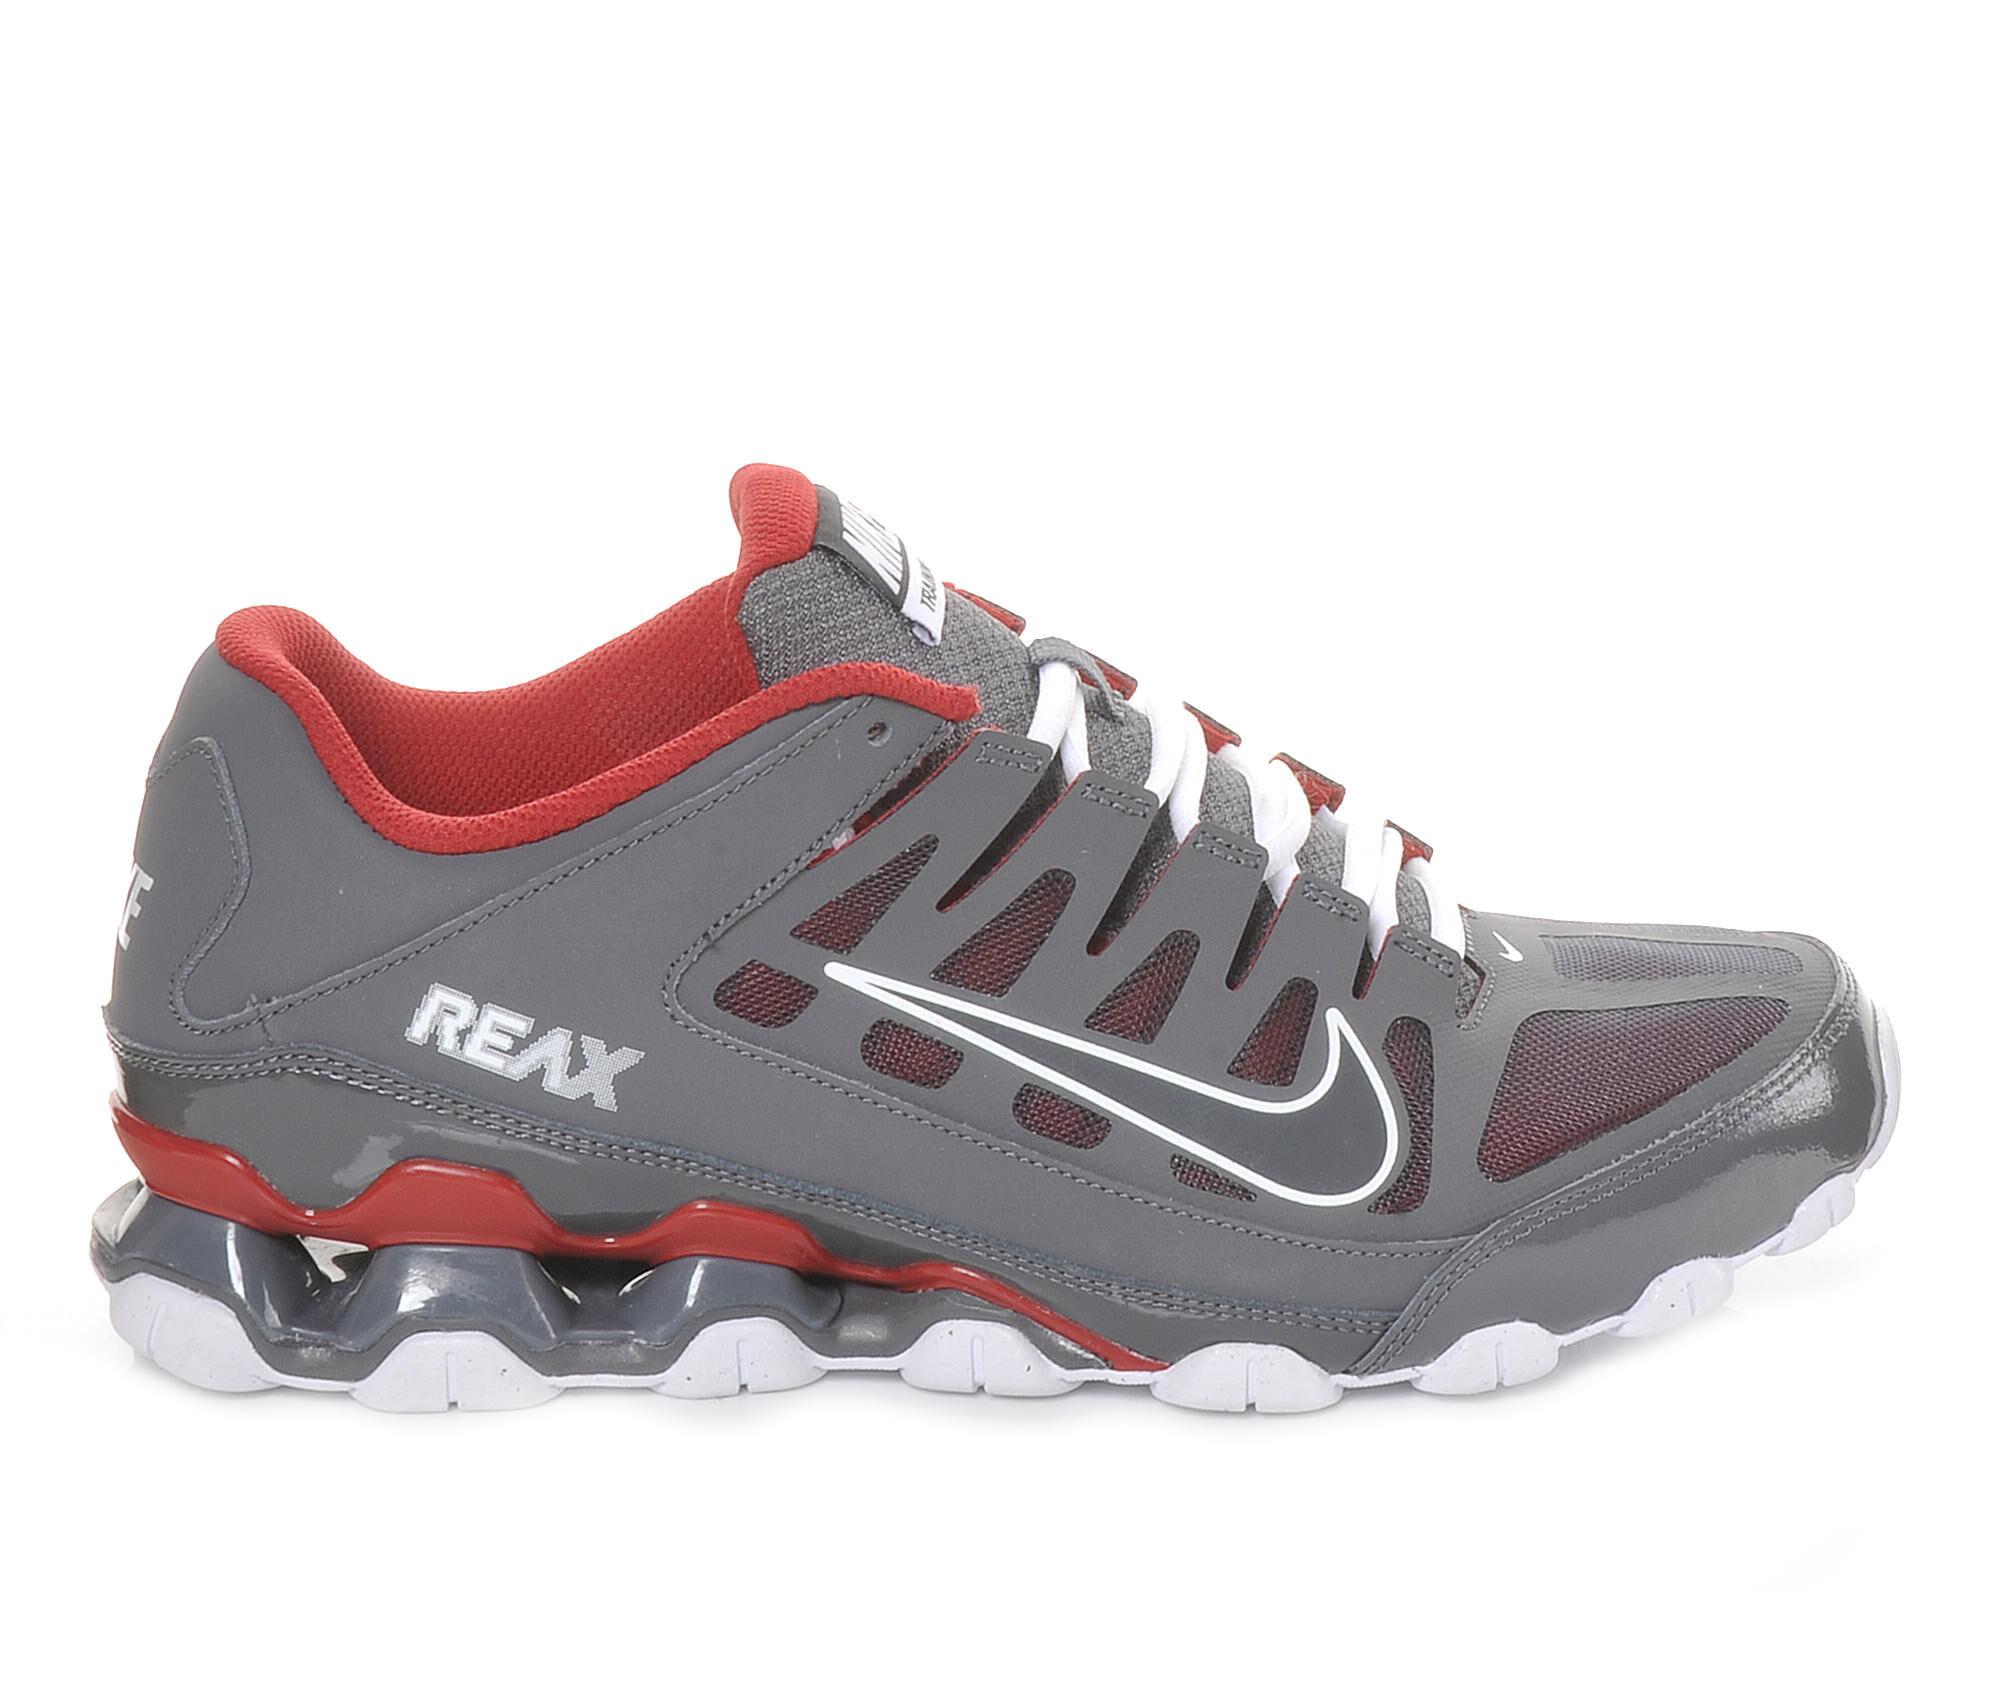 Men's Nike Reax 8 TR Mesh Training Shoes Grey/Red/White